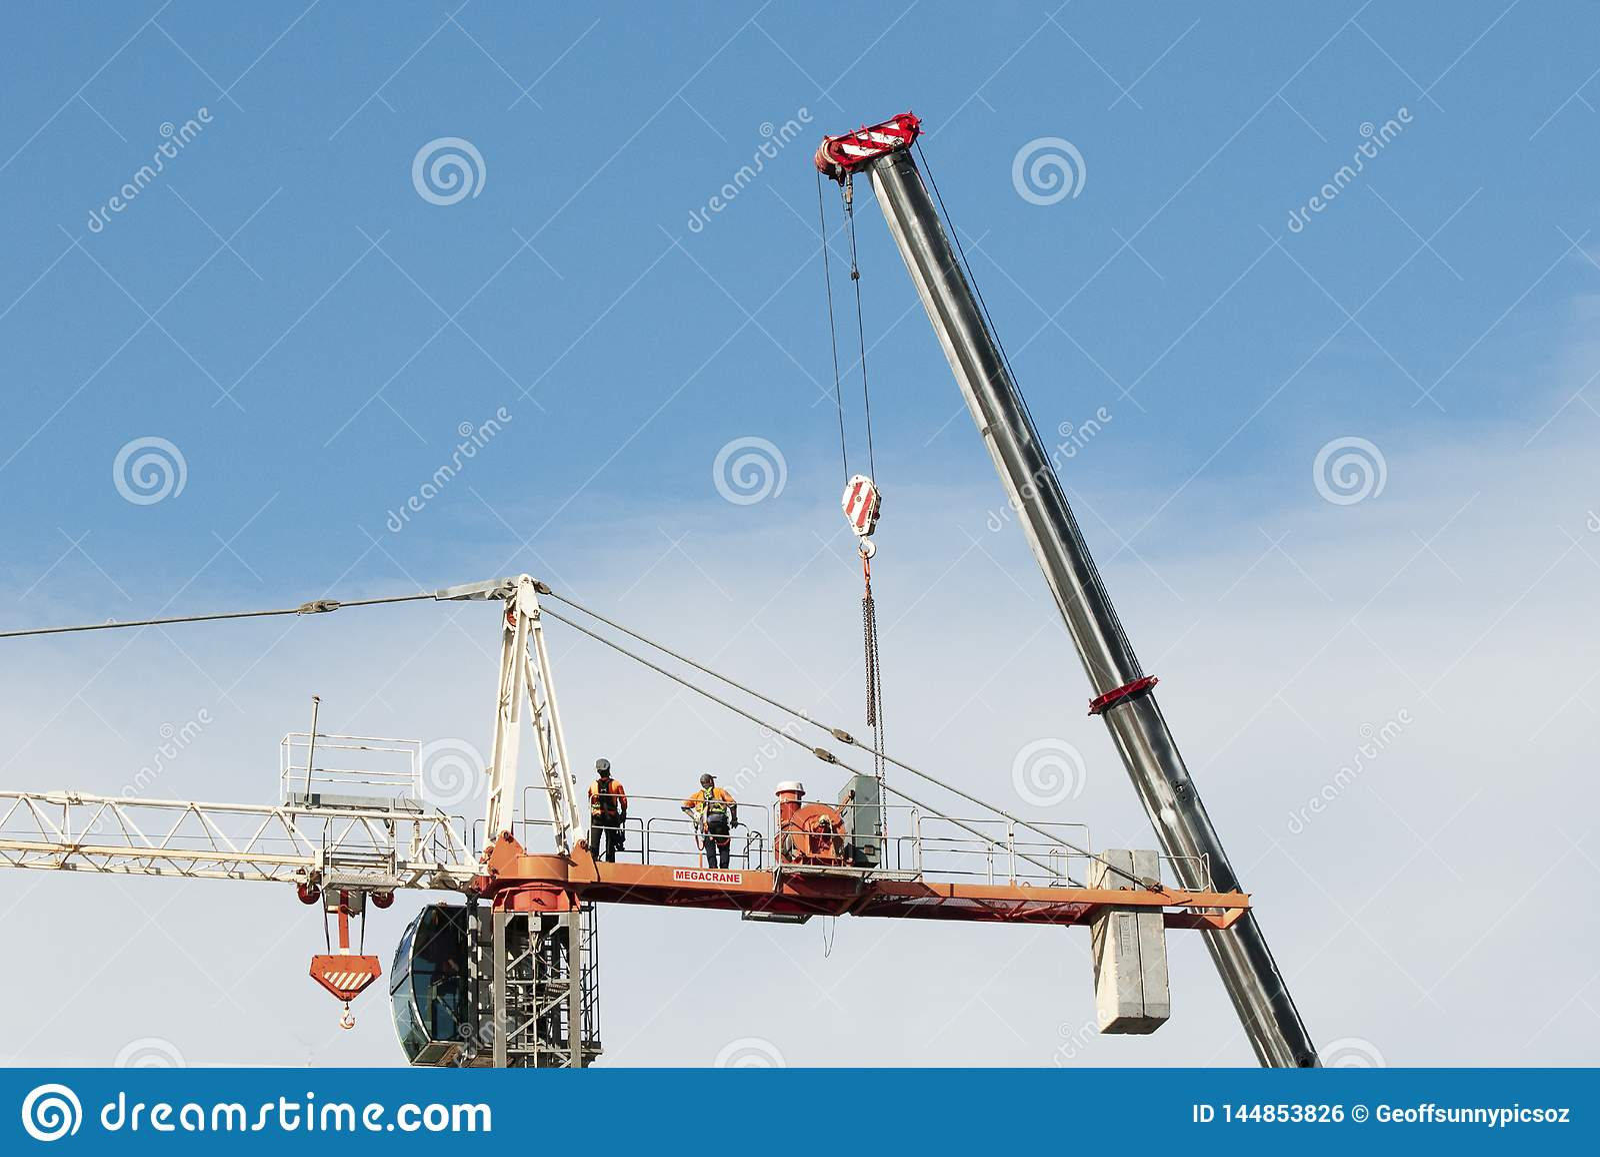 Construction crane removal. Update ed302 . Gosford. April 9, 2019